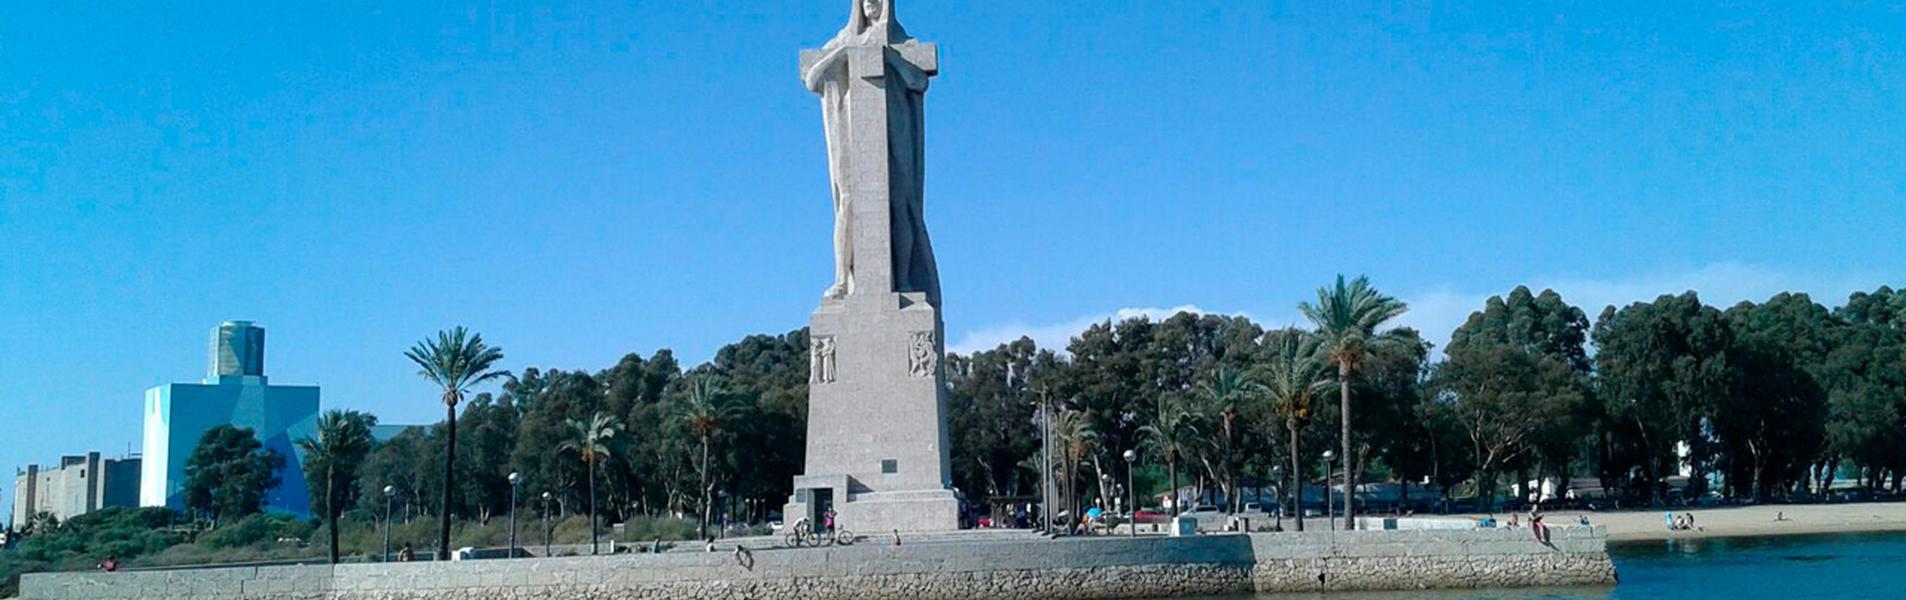 Monumento a la Fe Descubridora